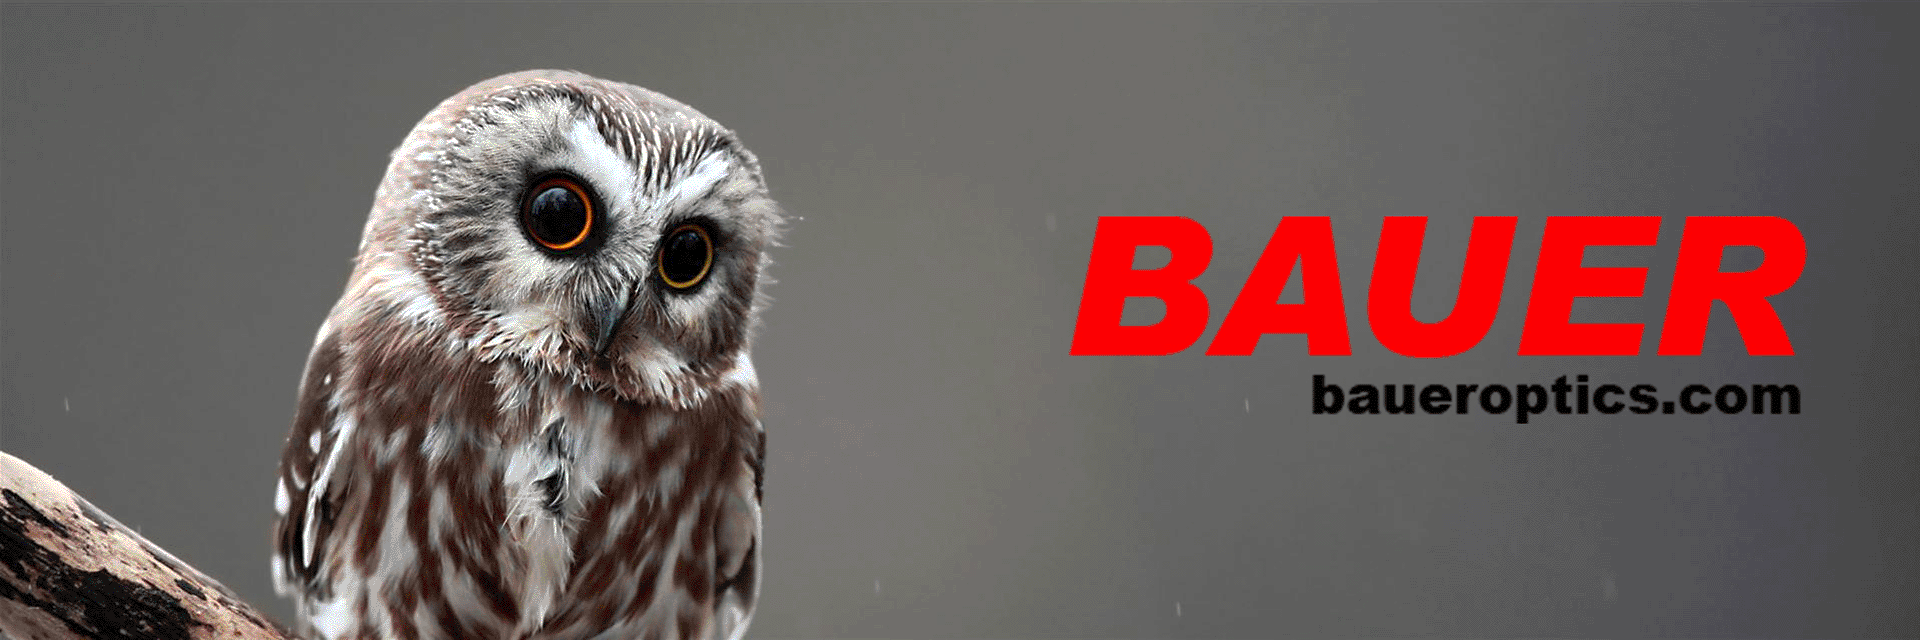 Bauer Title